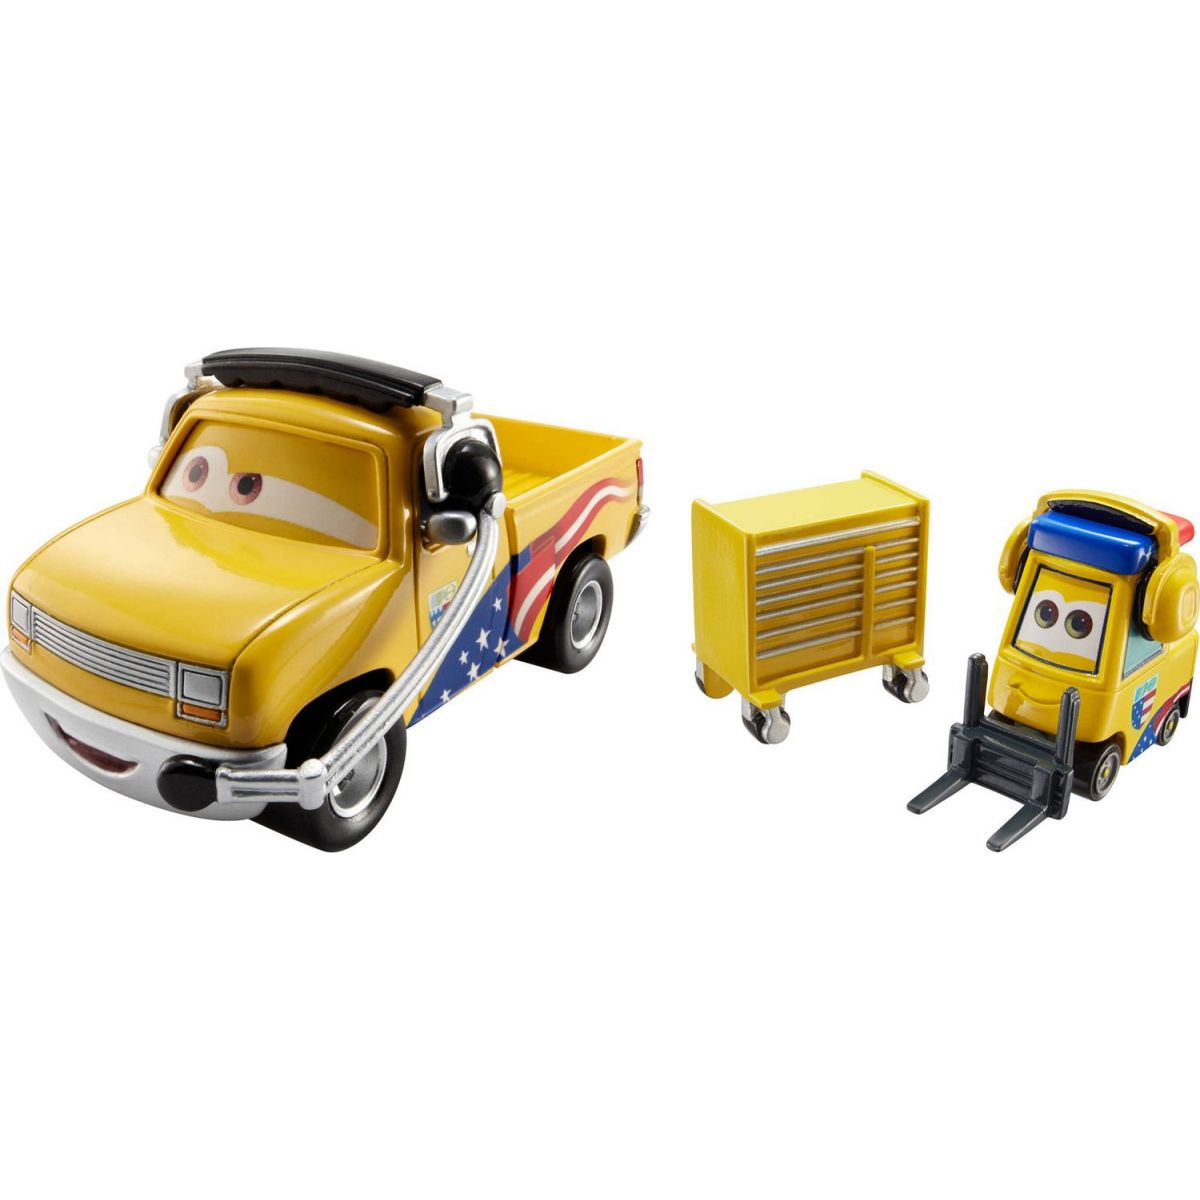 Mattel Cars 2 Autíčka 2ks Jeff Gorvette Pitty a John Lassetire